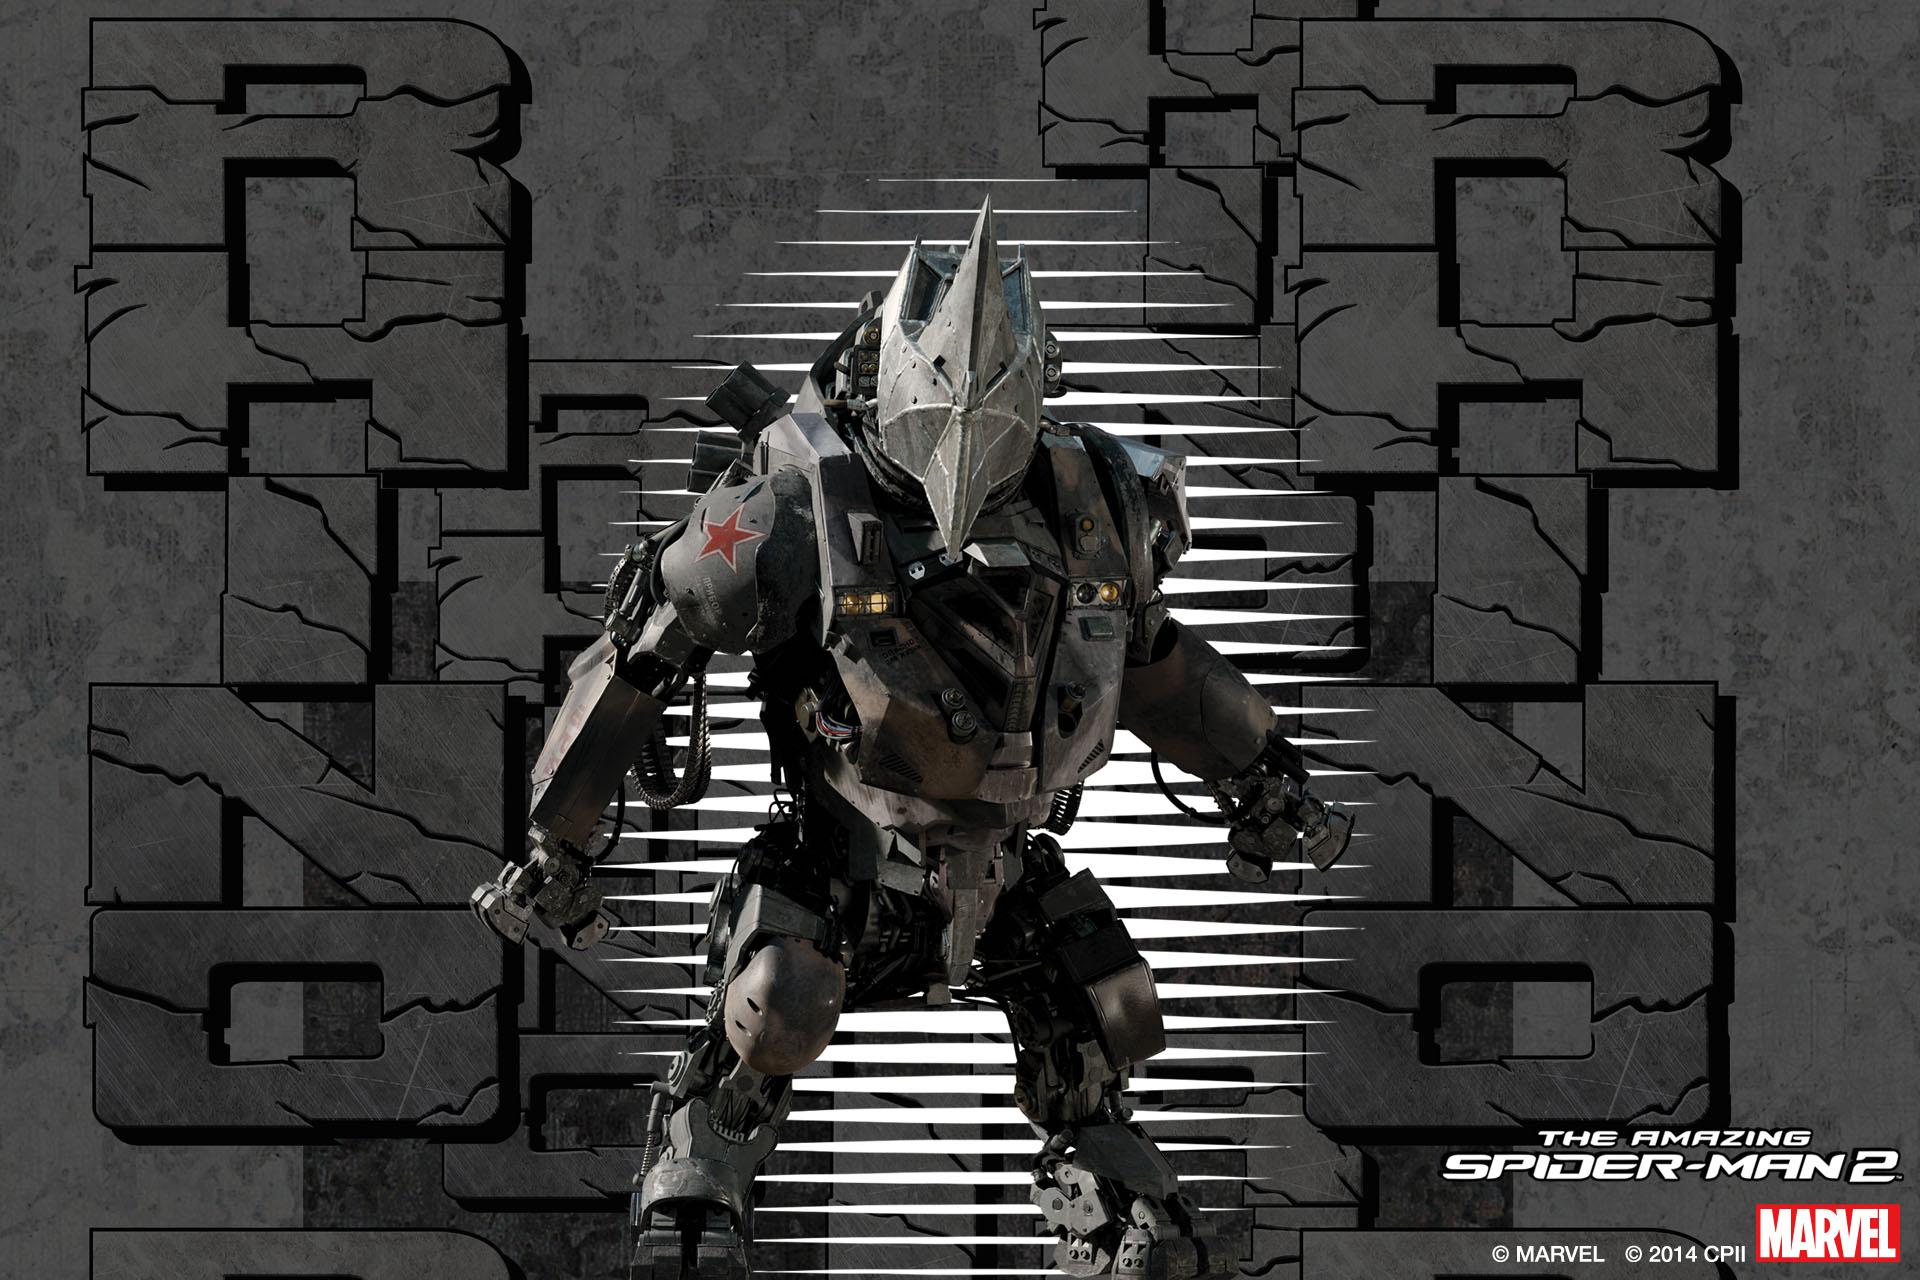 Image - Desktop-wallpaper-4-1- jpg | Amazing Spider-Man Wiki